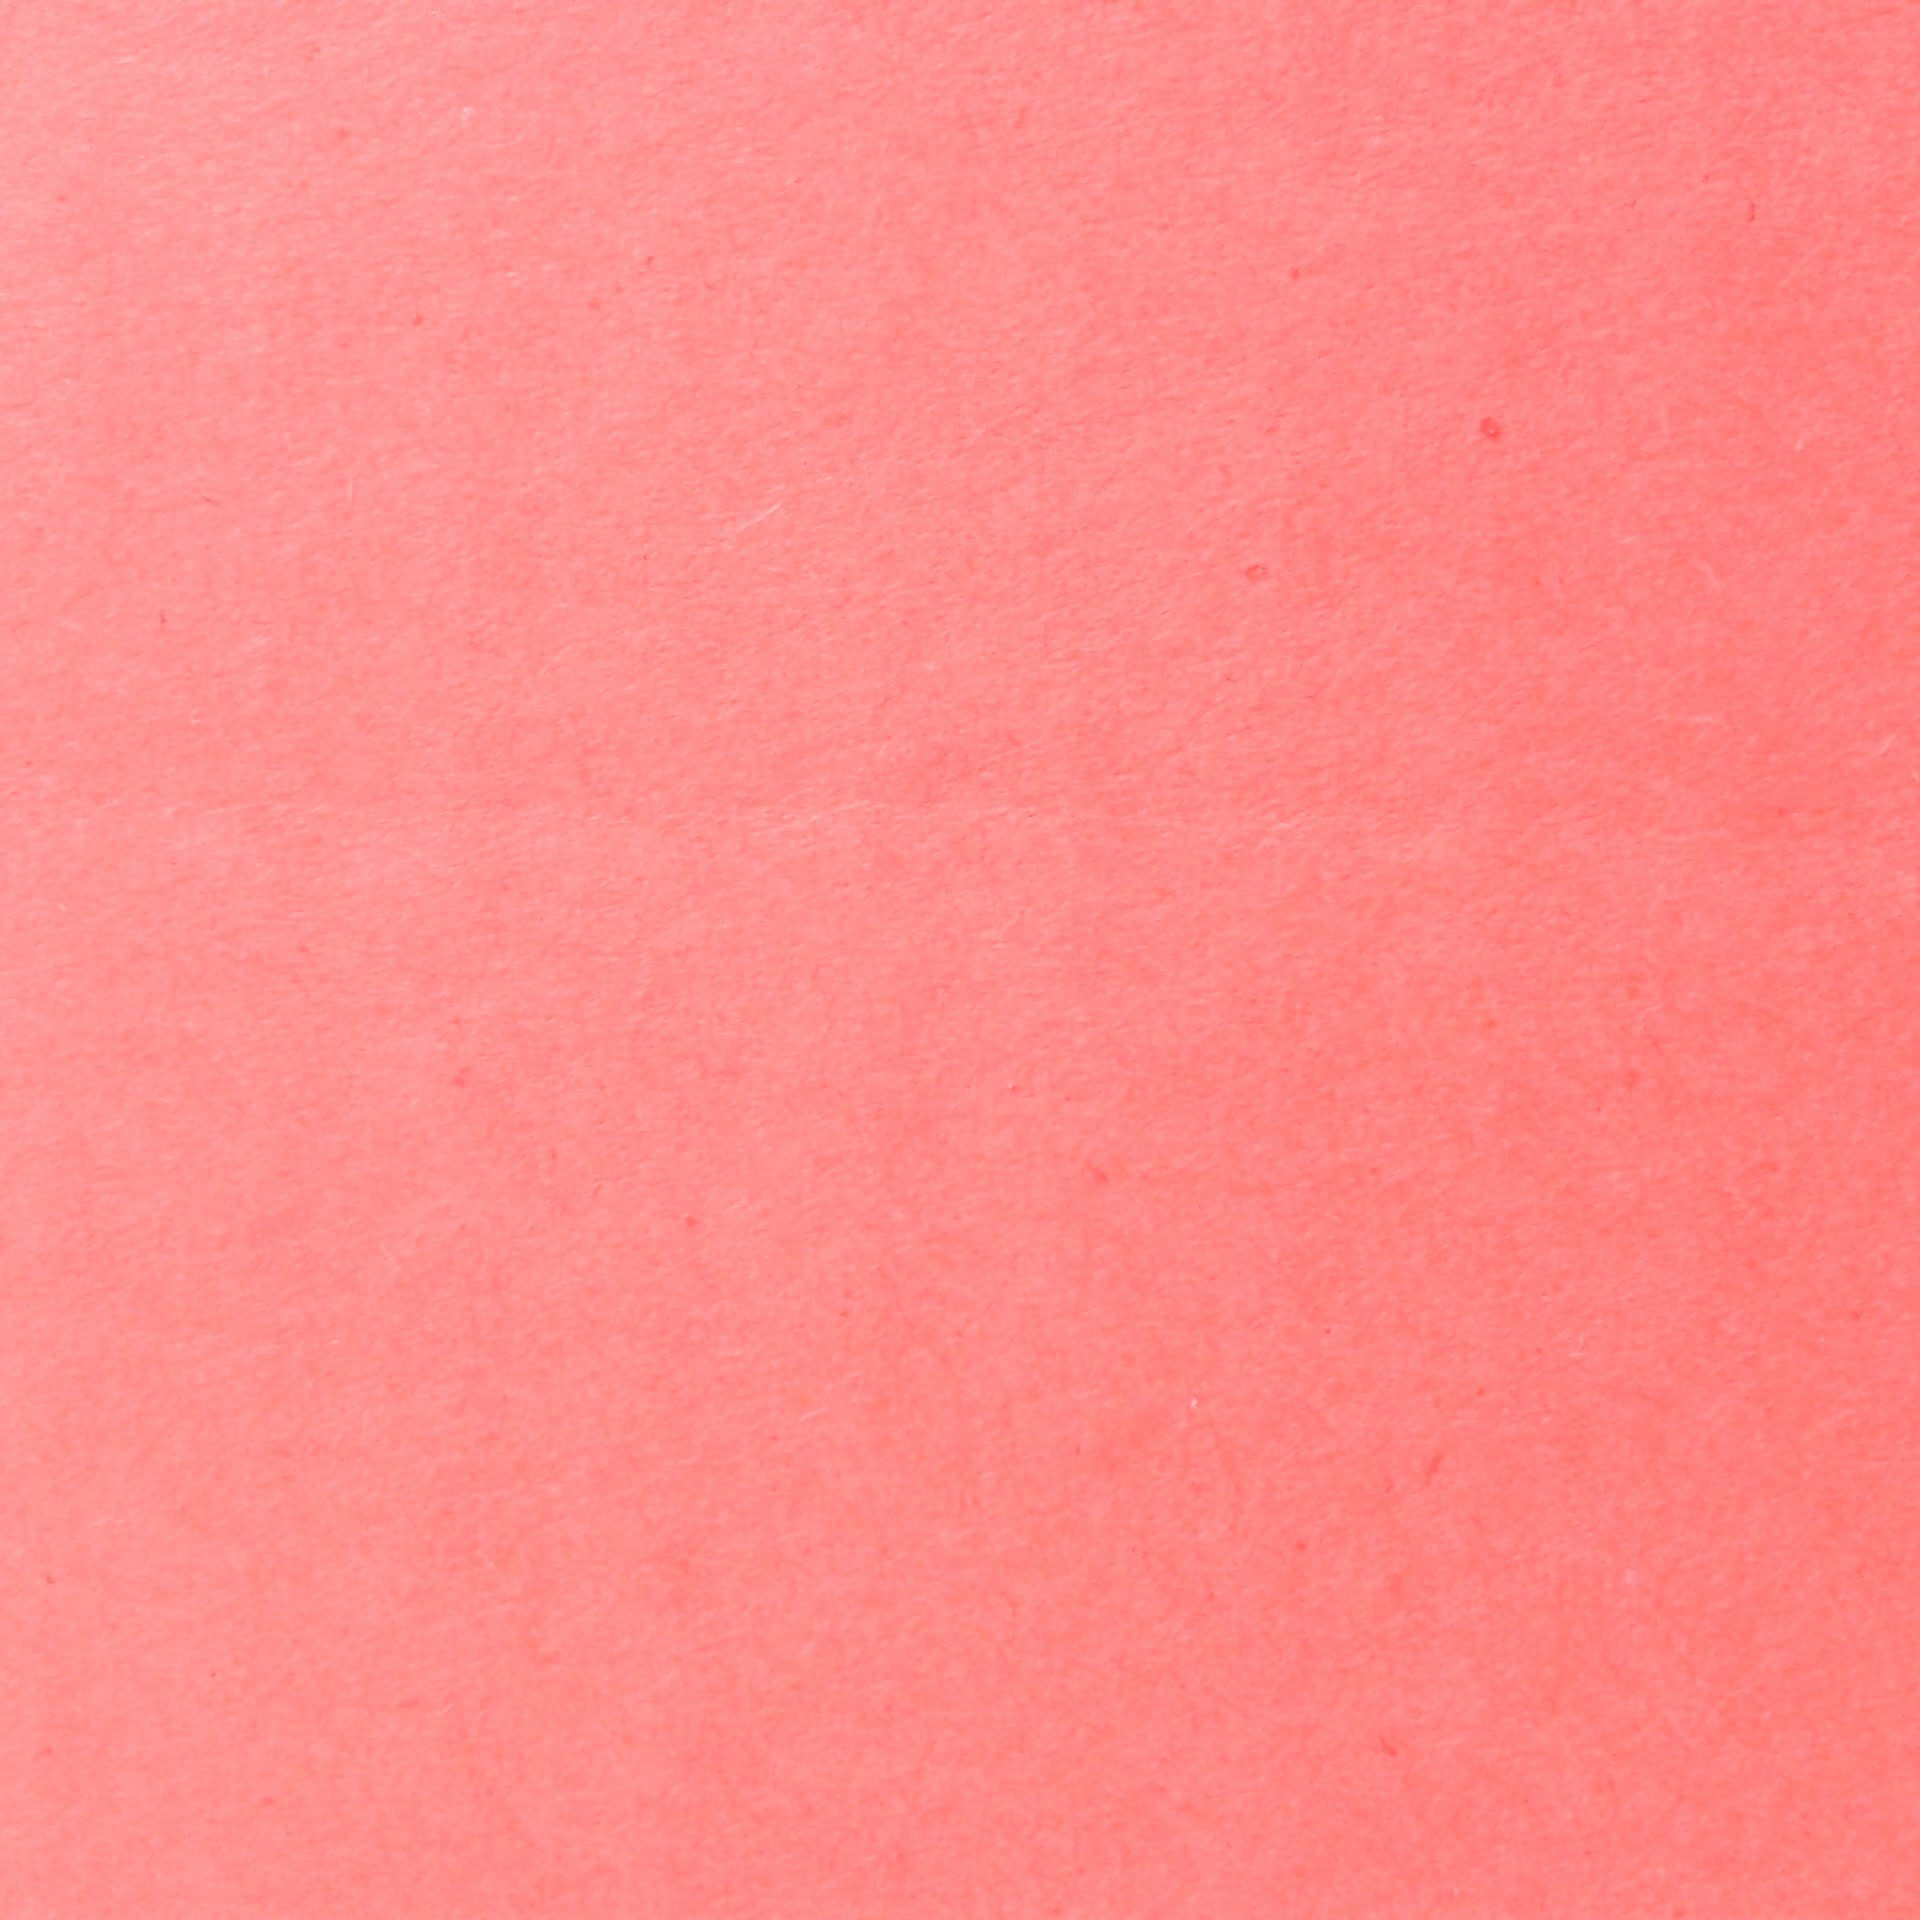 OPT karton pink